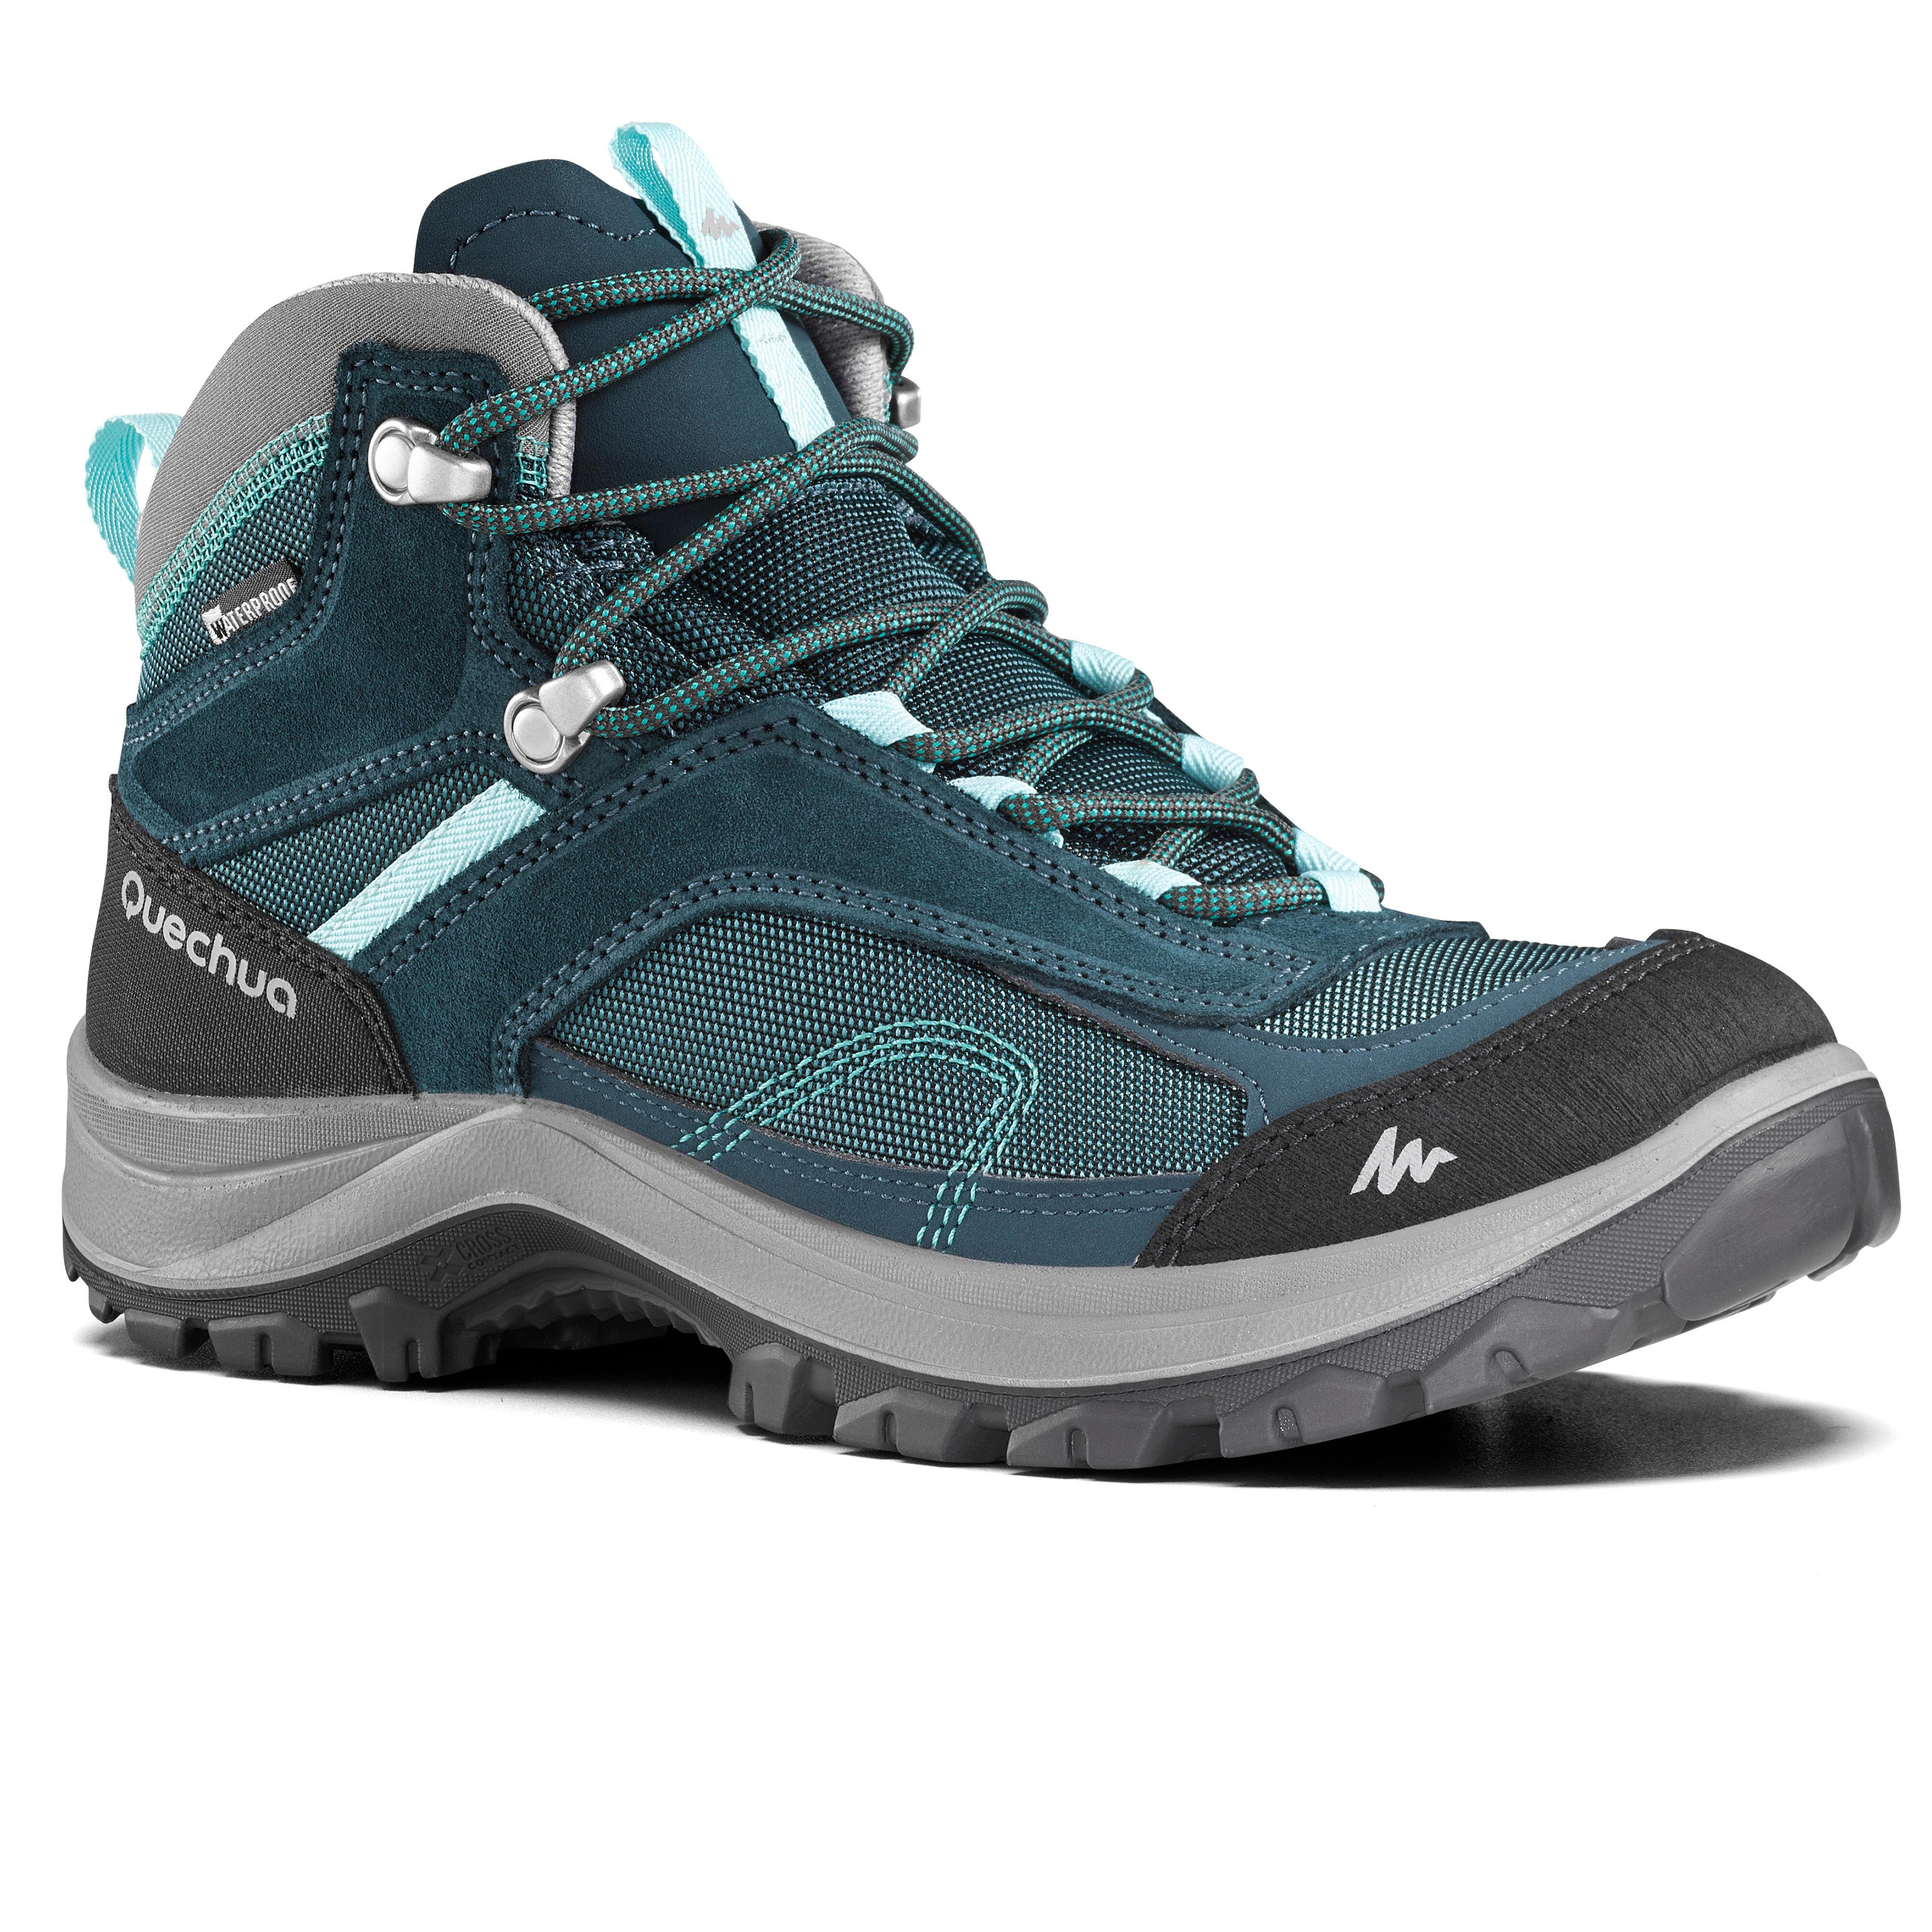 966b1f03dcc Mujer Zapatos De Trekking Trekking Zapatos De Zapatos Mujer wZUREq0q